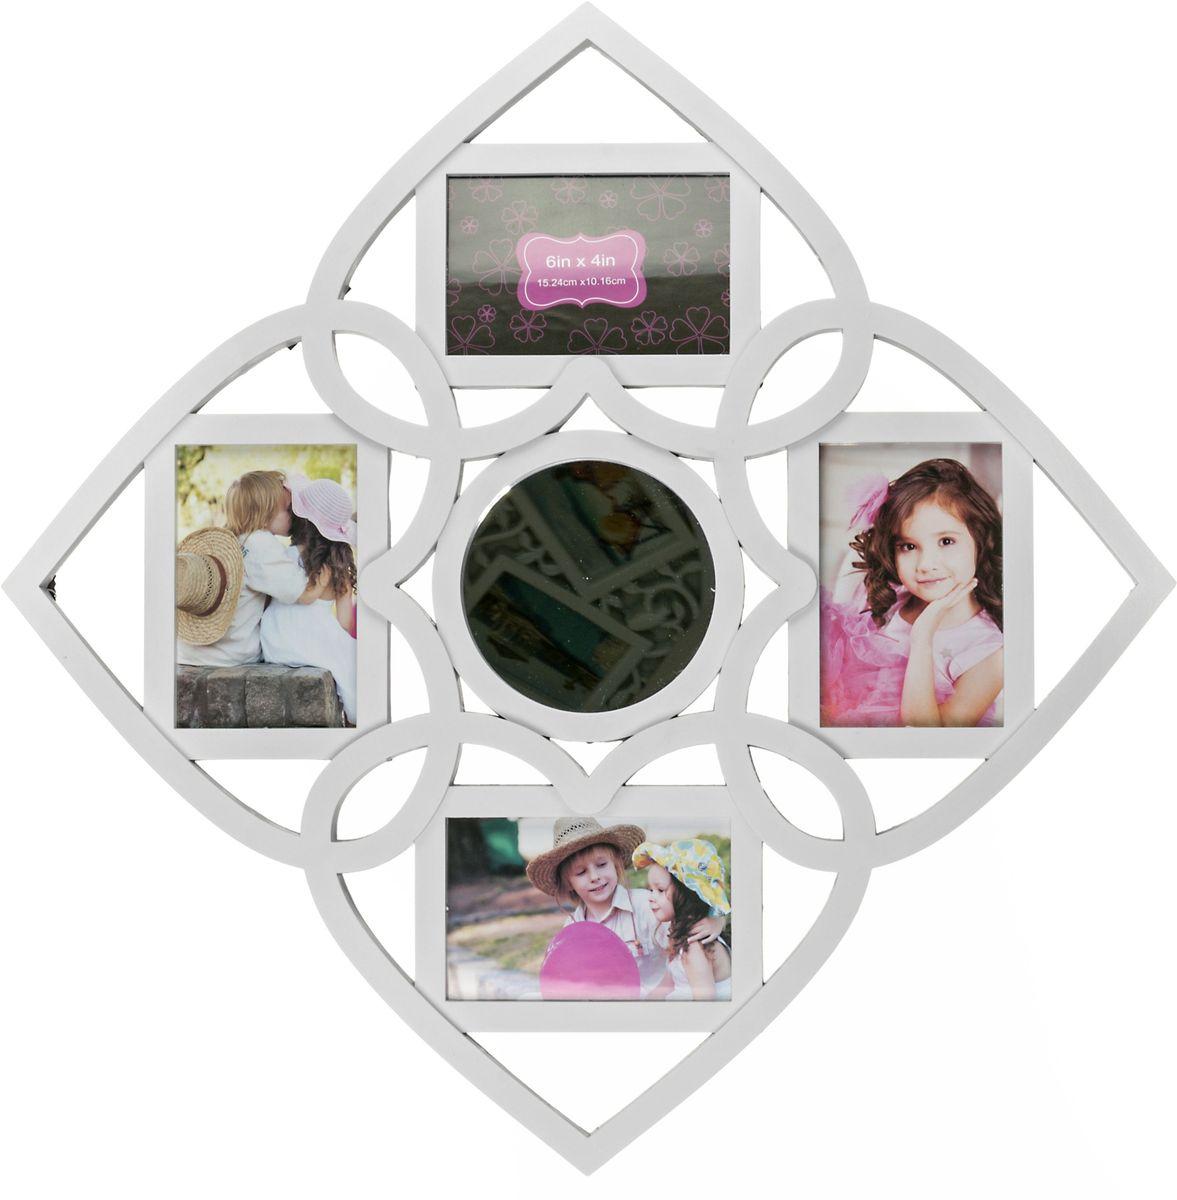 Коллаж Platinum, цвет: белый, с круглым зеркалом, 4 фоторамки. BIN-1122552BIN-1122552-White-БелыйПластиковый коллаж с 4 фото 10х15 см,1 фото 10х10 см.